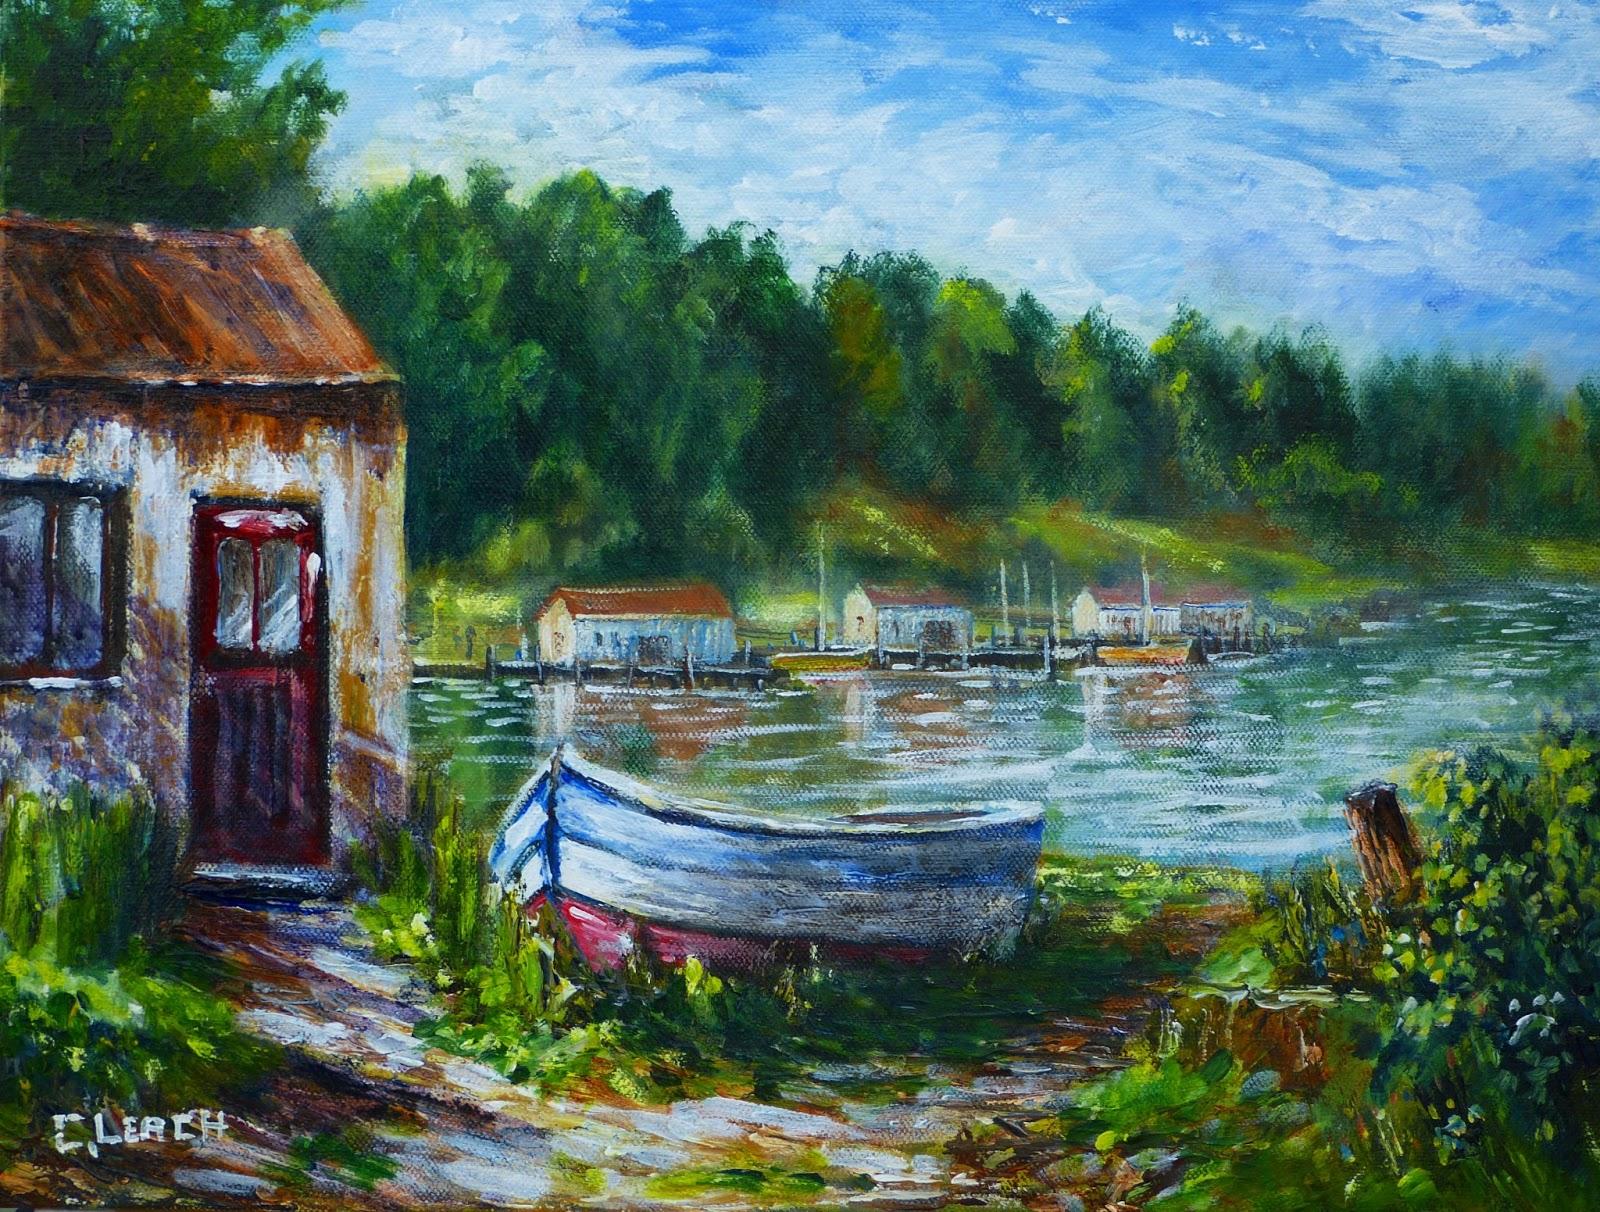 Acrylic Landscapes: Boat New Acrylic Painting